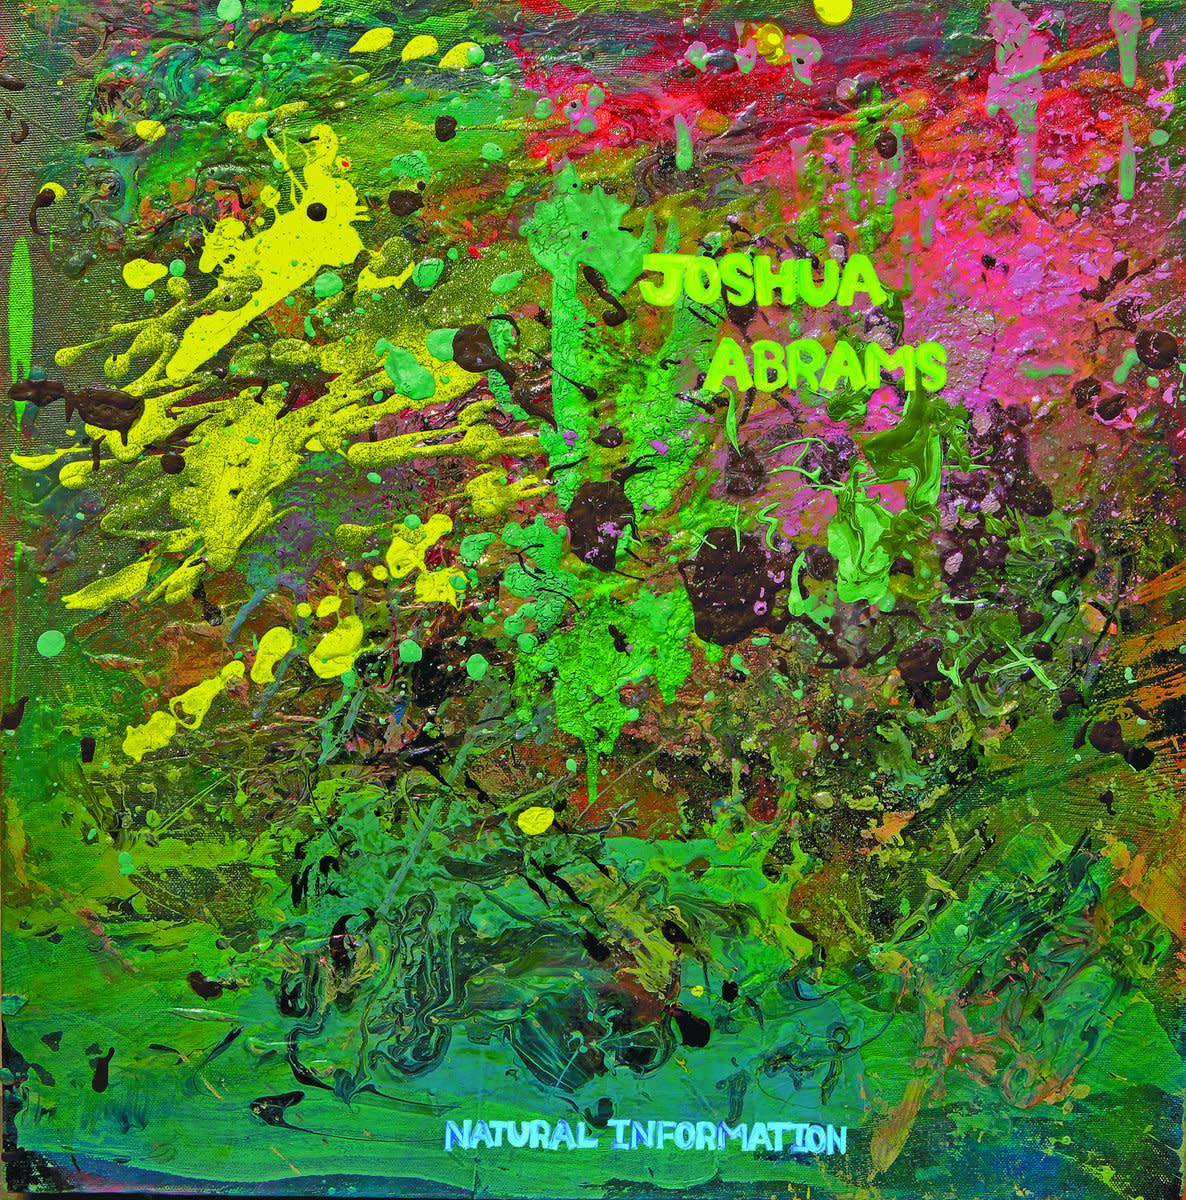 Joshua Abrams • Natural Information-1